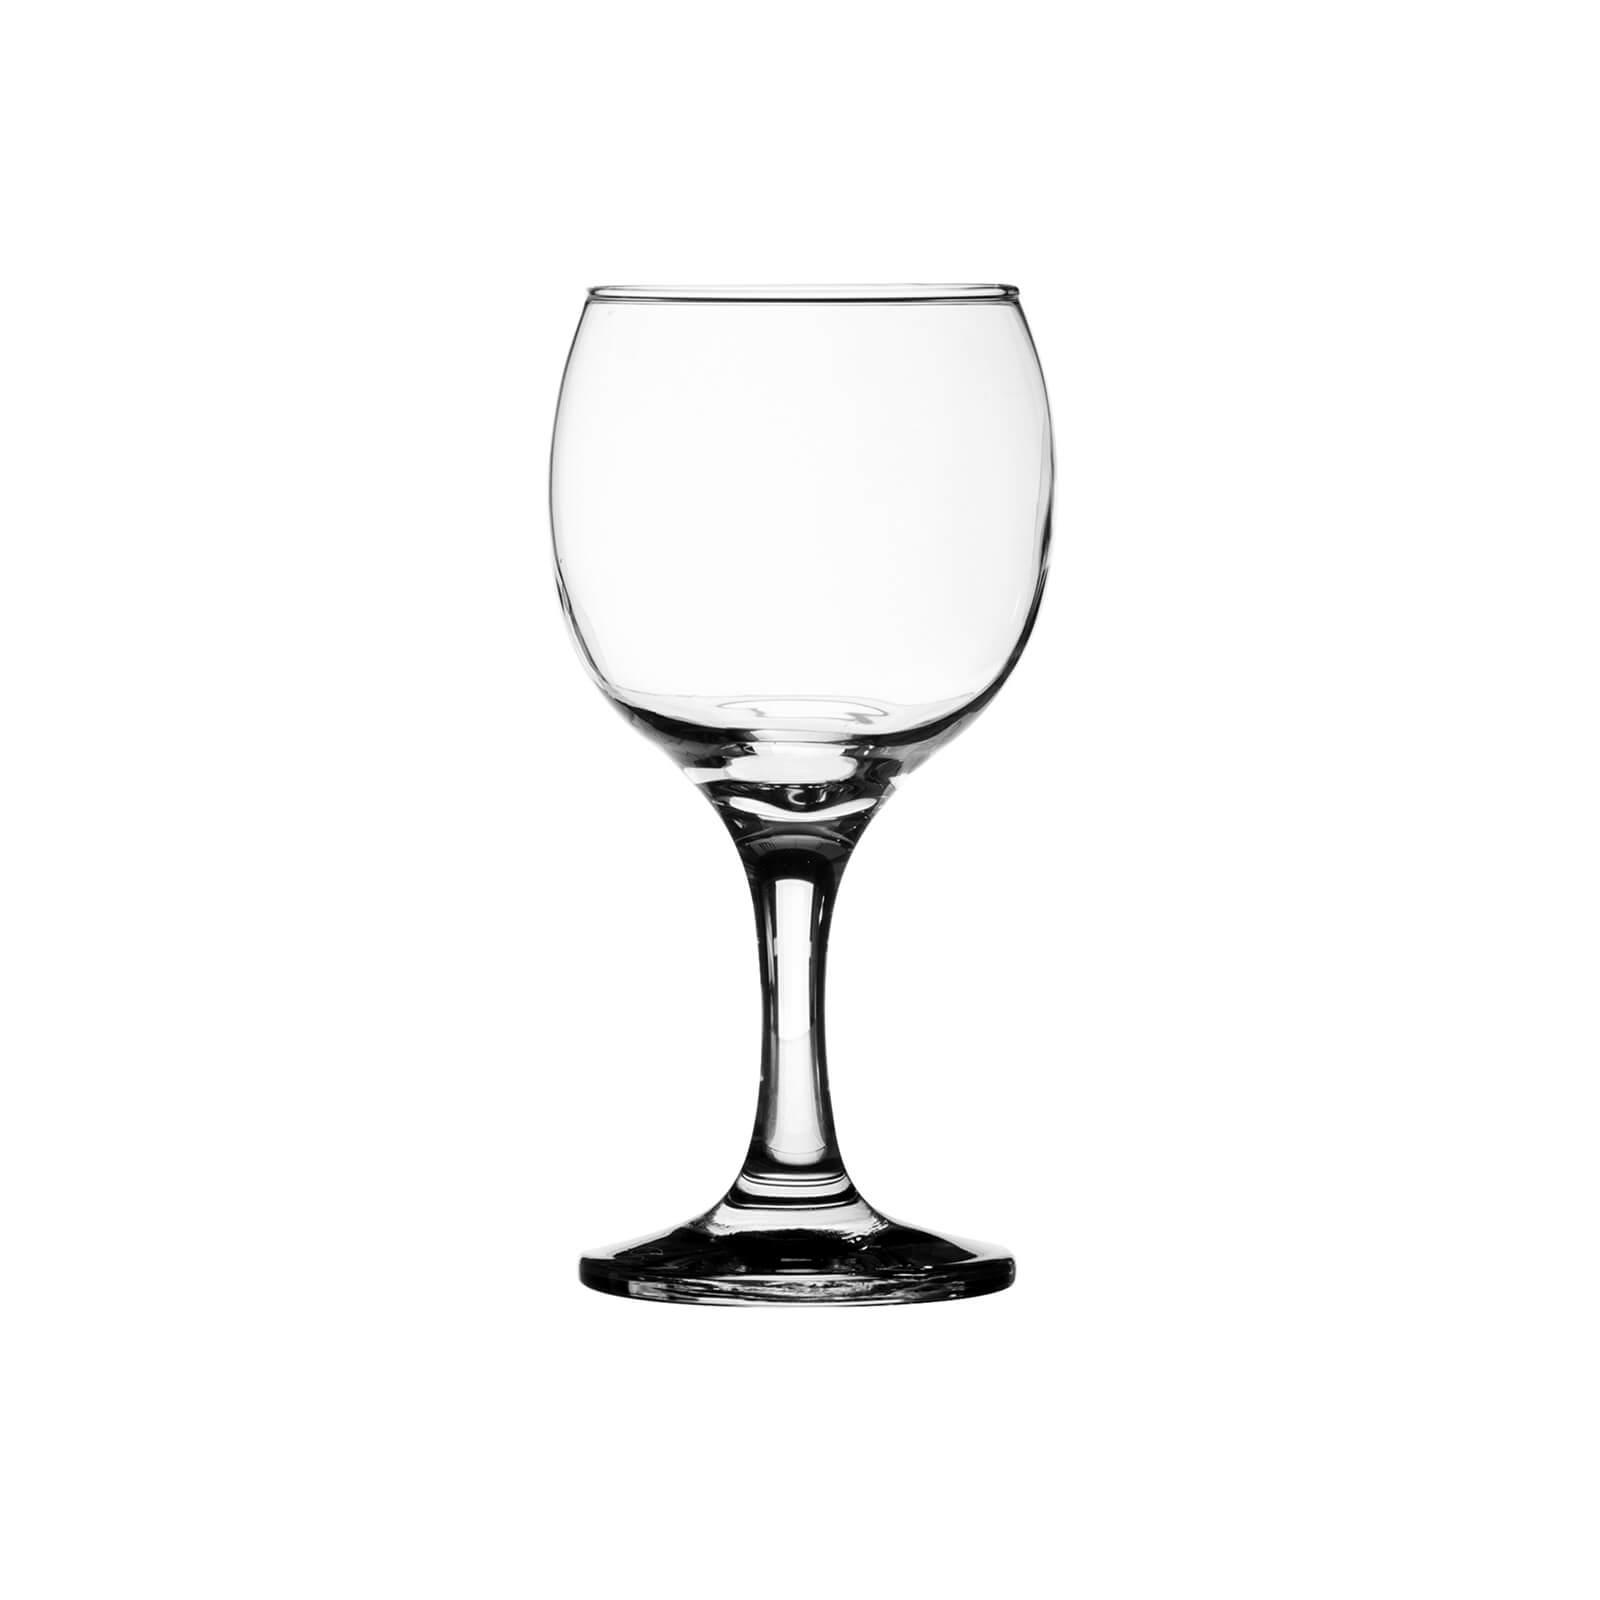 Essentials Ascot 23cl White Wine Glasses - Set of 6